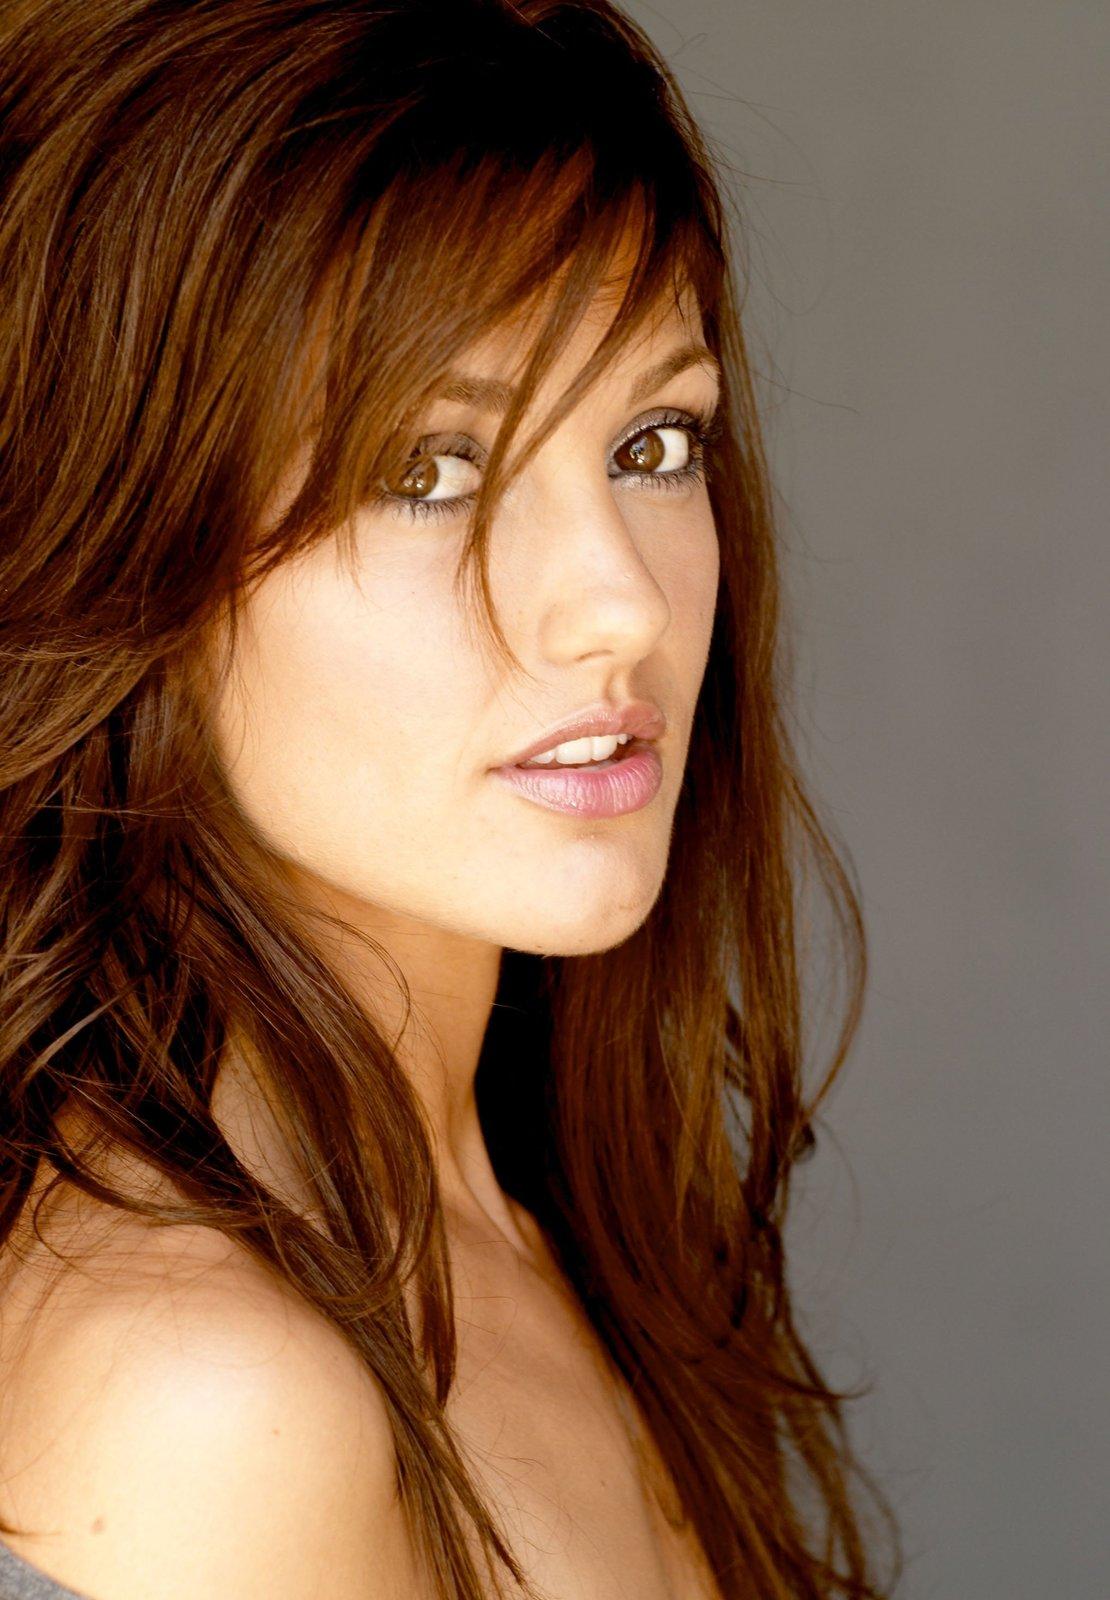 http://2.bp.blogspot.com/-BYGCOnR-j9A/TgS-sL6vaOI/AAAAAAAABJU/91NvJWvUEc8/s1600/minka-kelly-nude.jpg